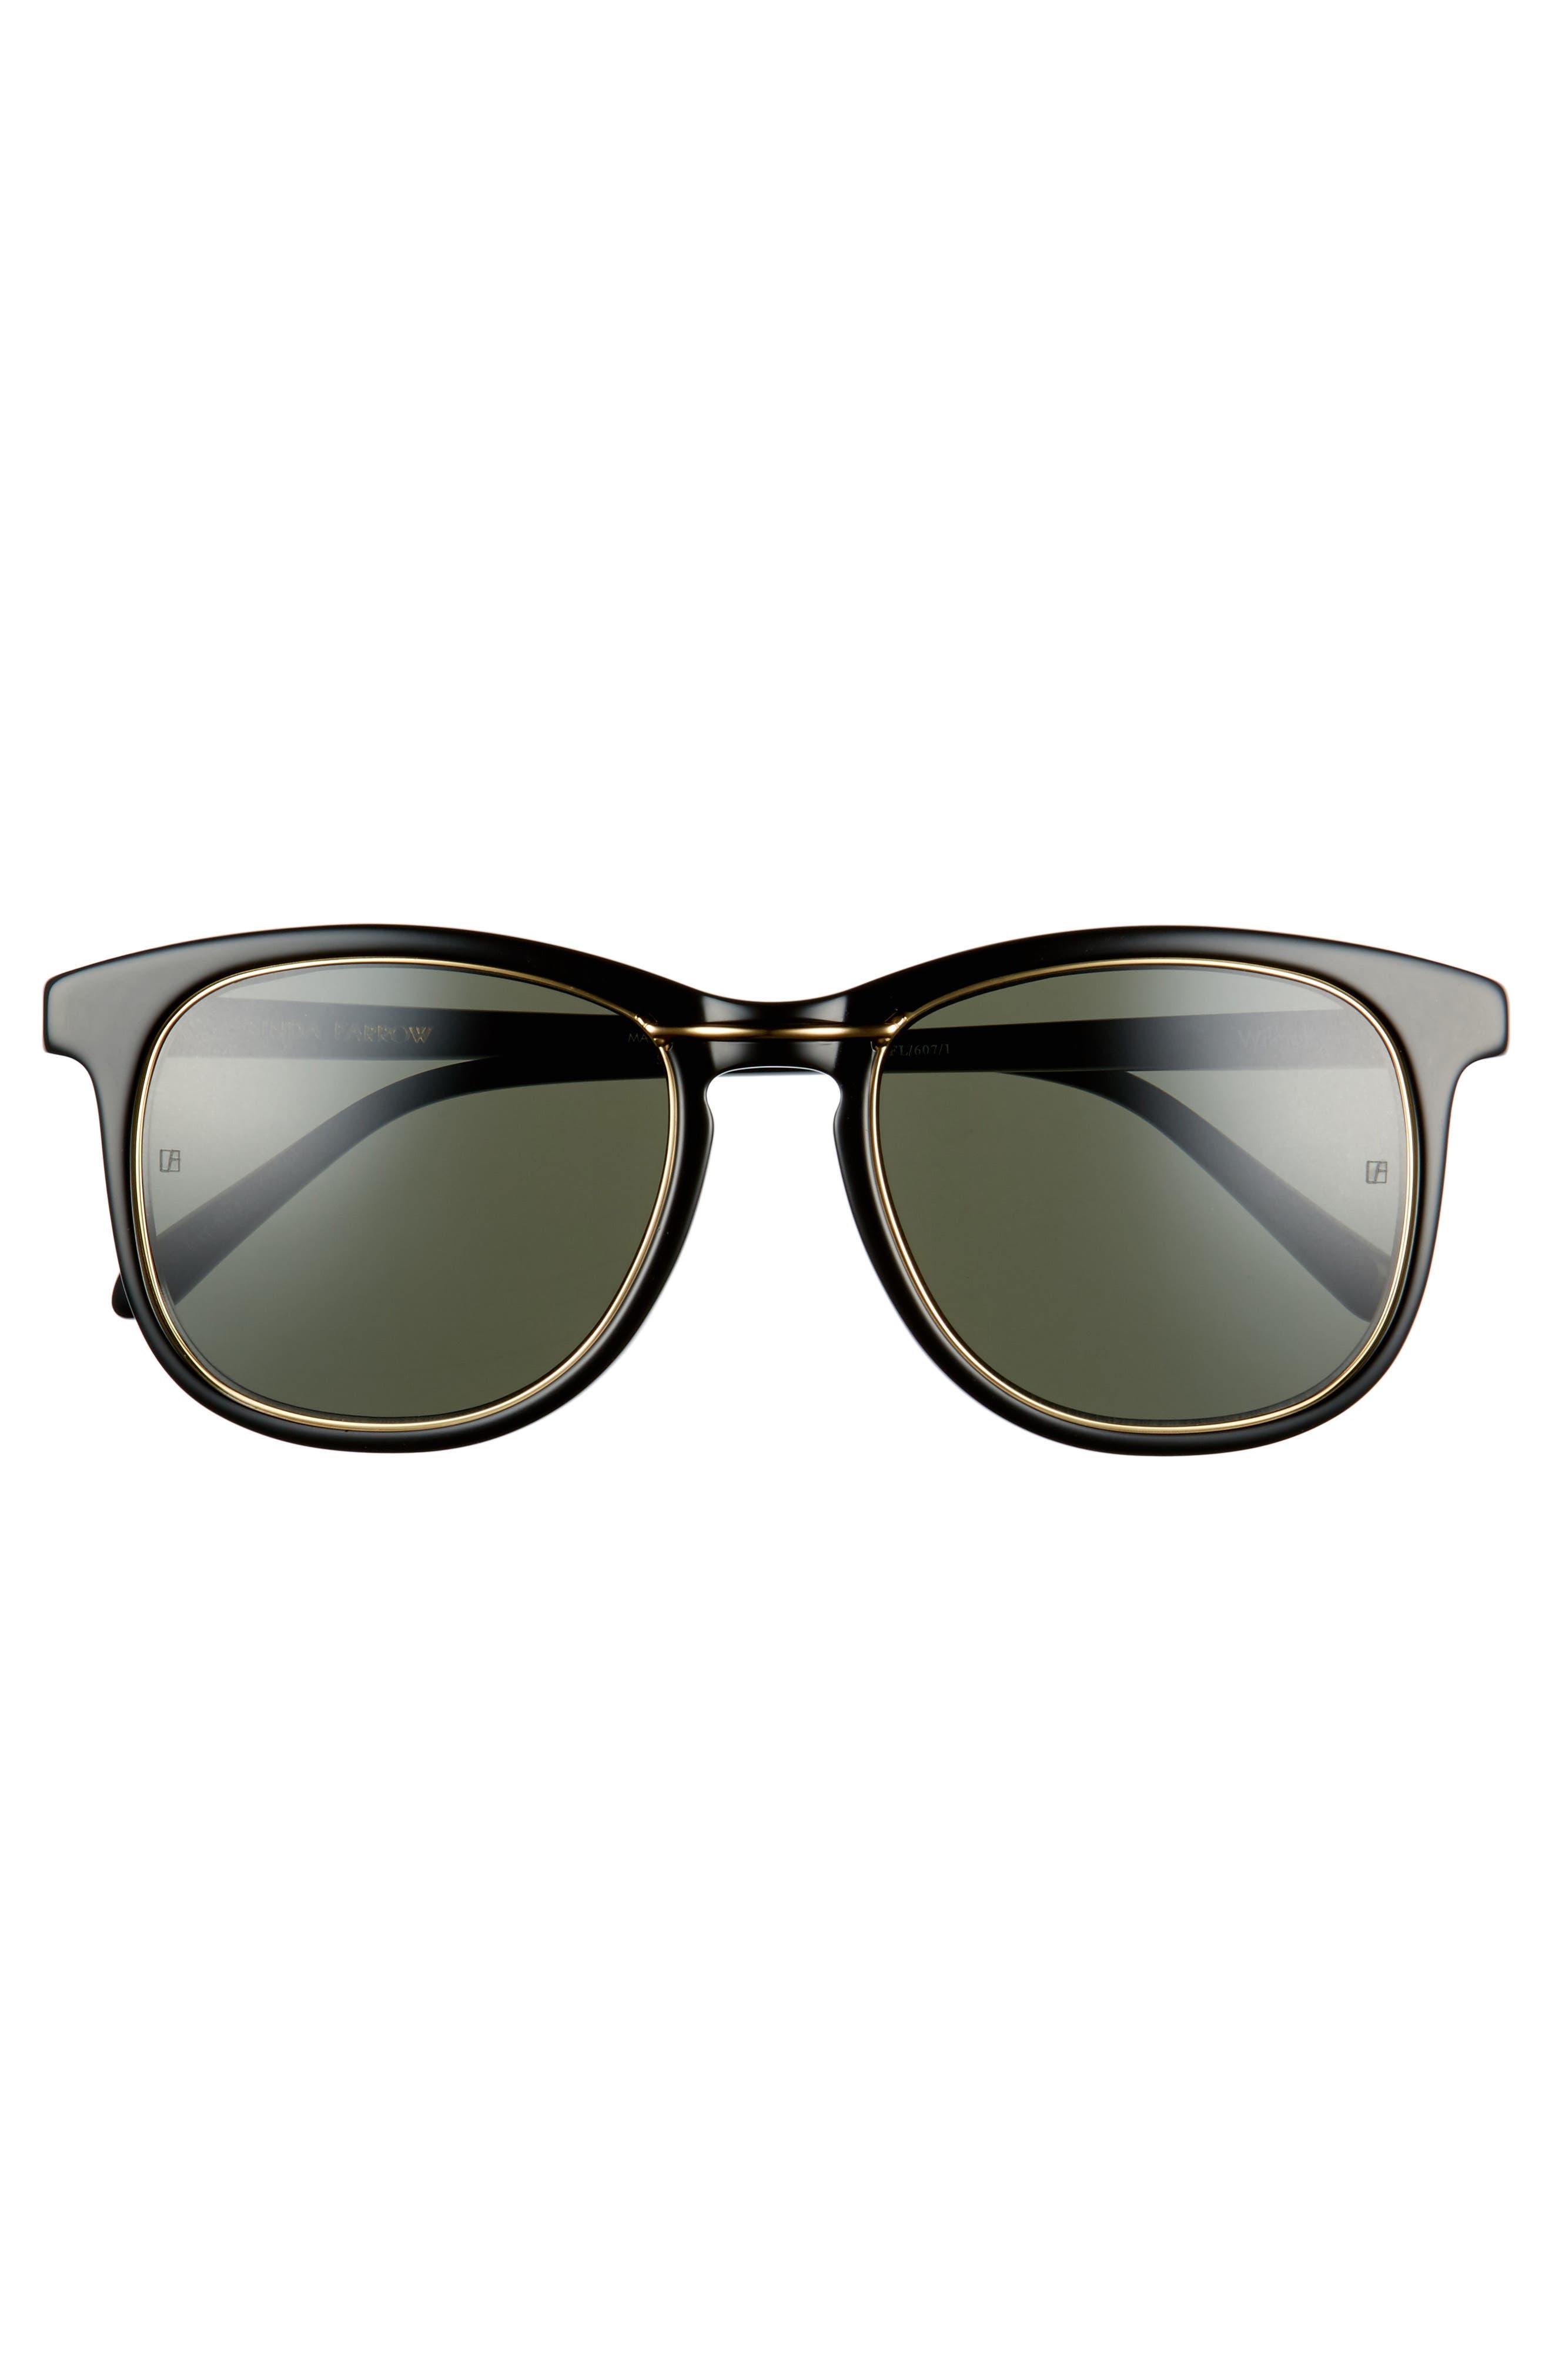 53mm Sunglasses,                             Alternate thumbnail 3, color,